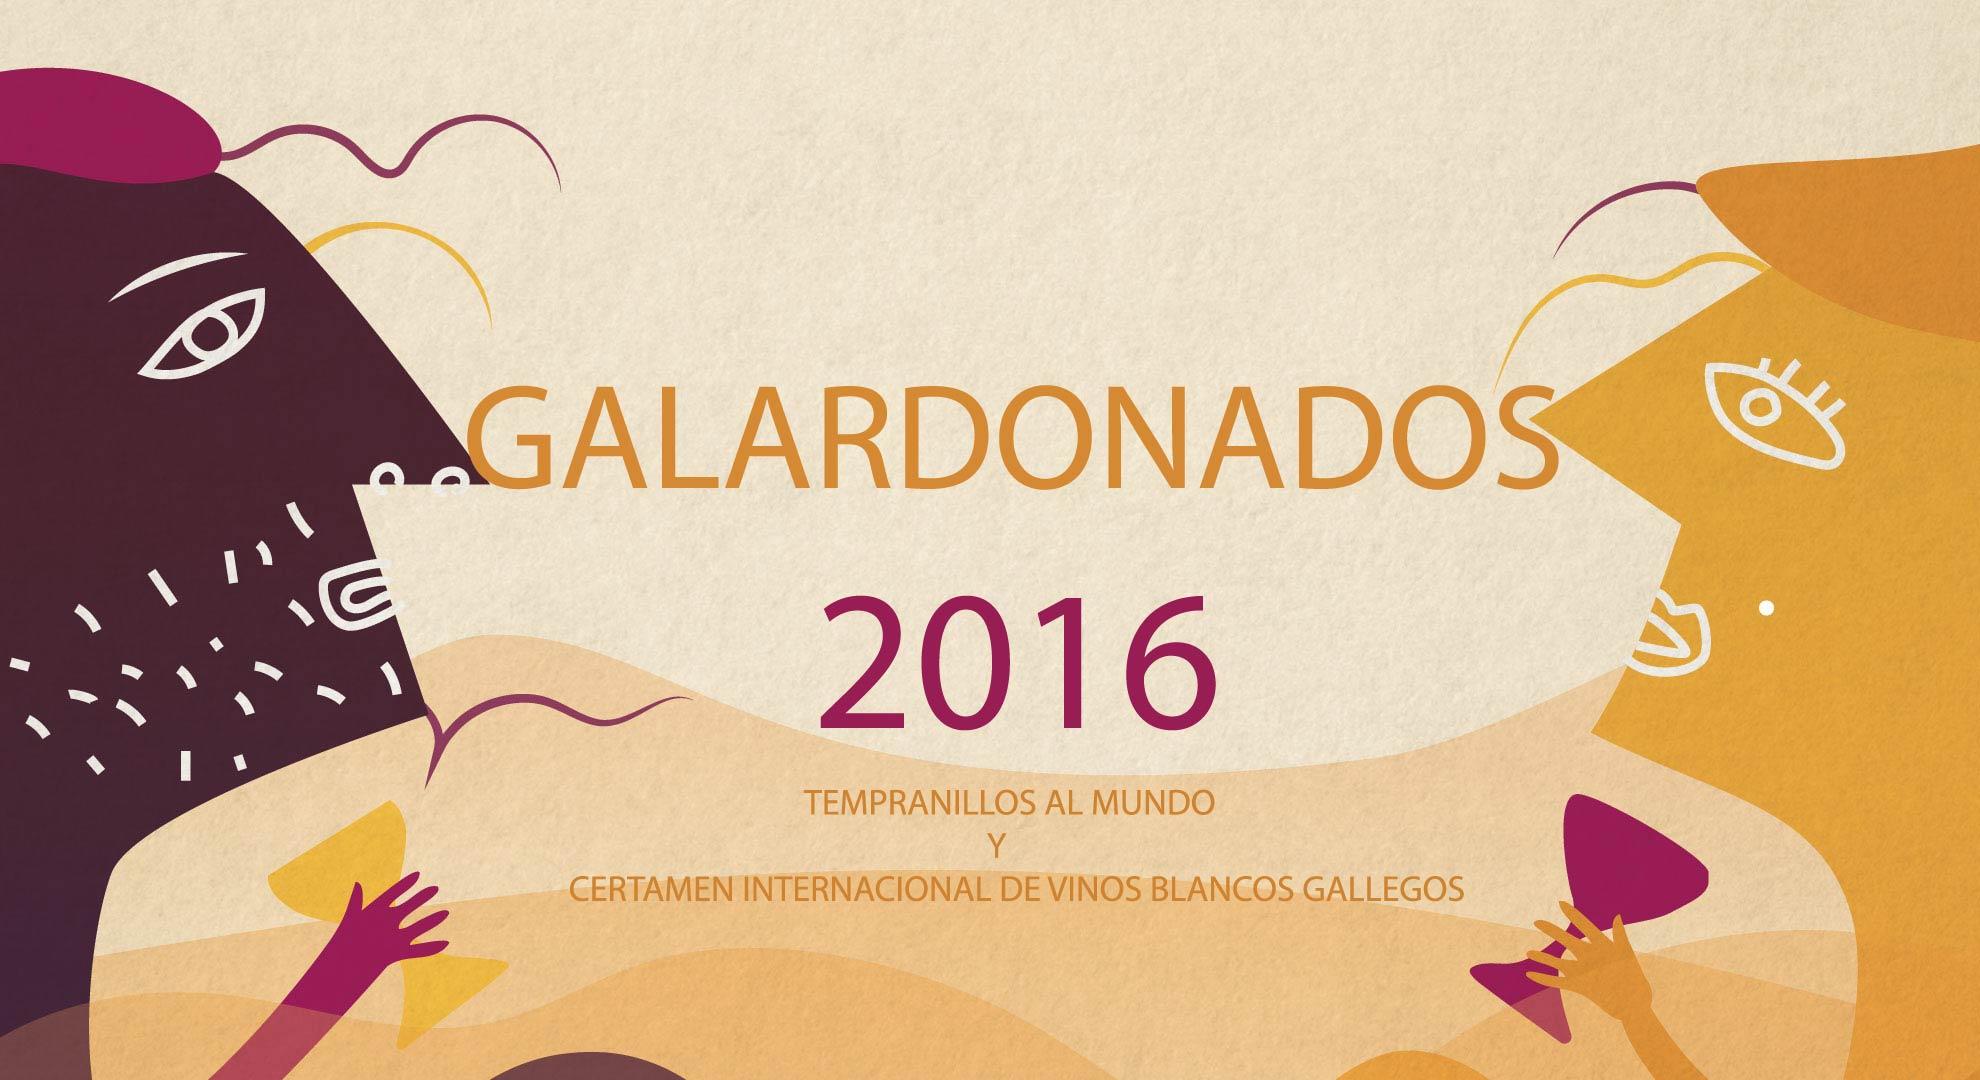 GALARDONADOS TAM 2016